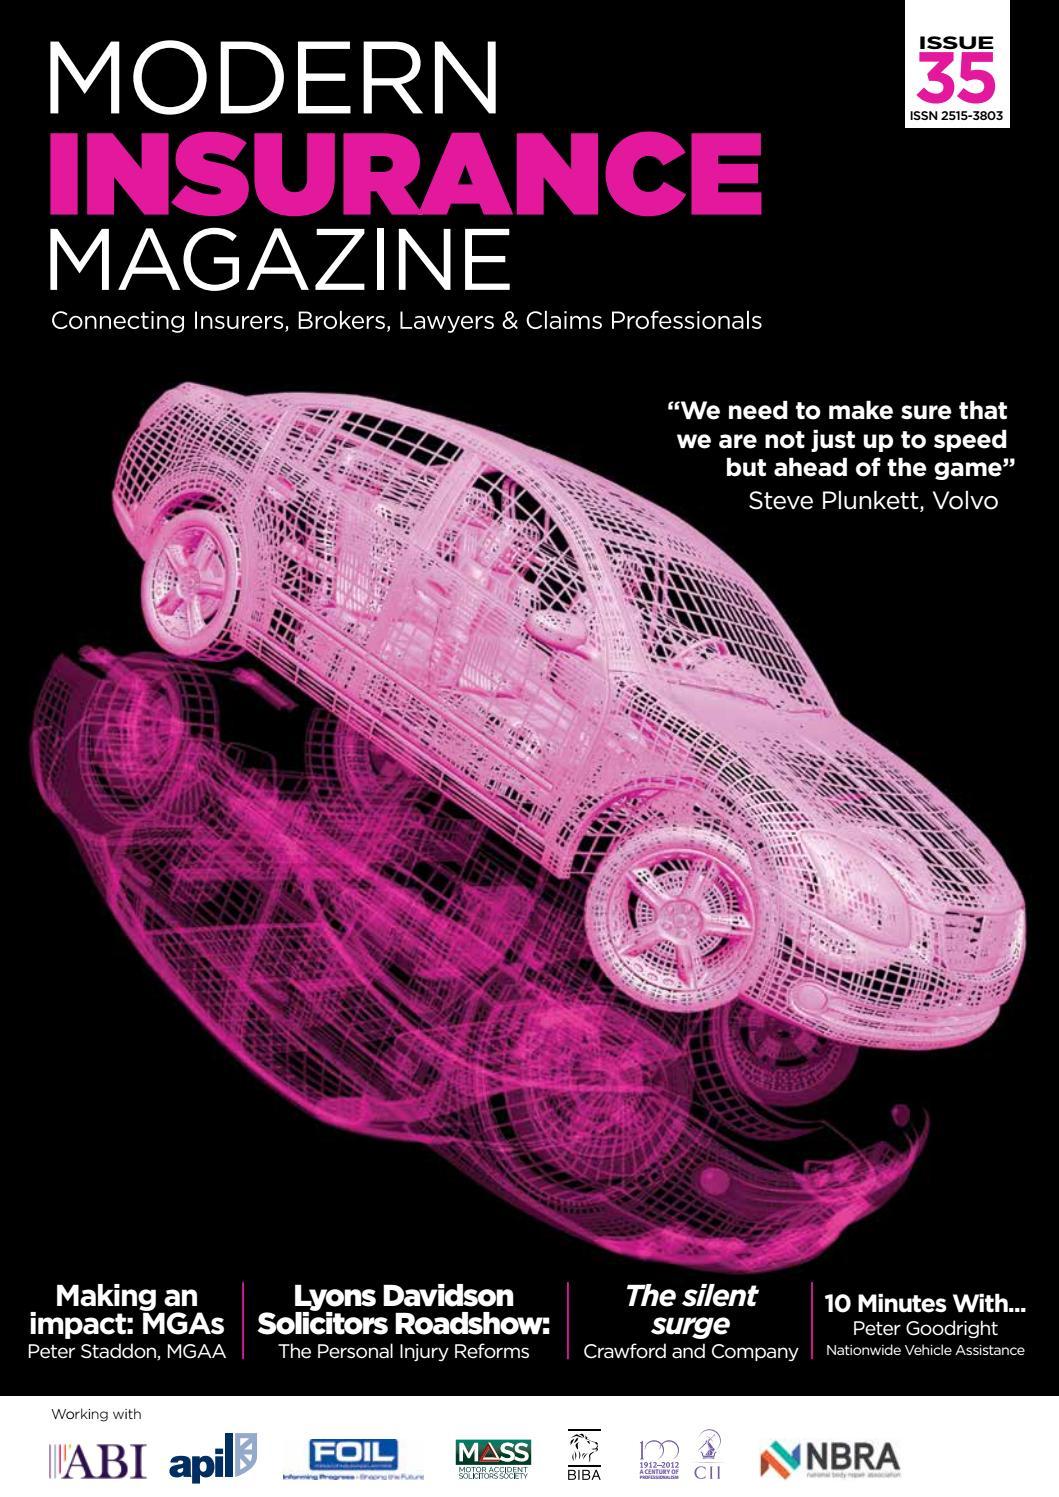 Modern Insurance Magazine Issue 35 by Charlton Grant - issuu